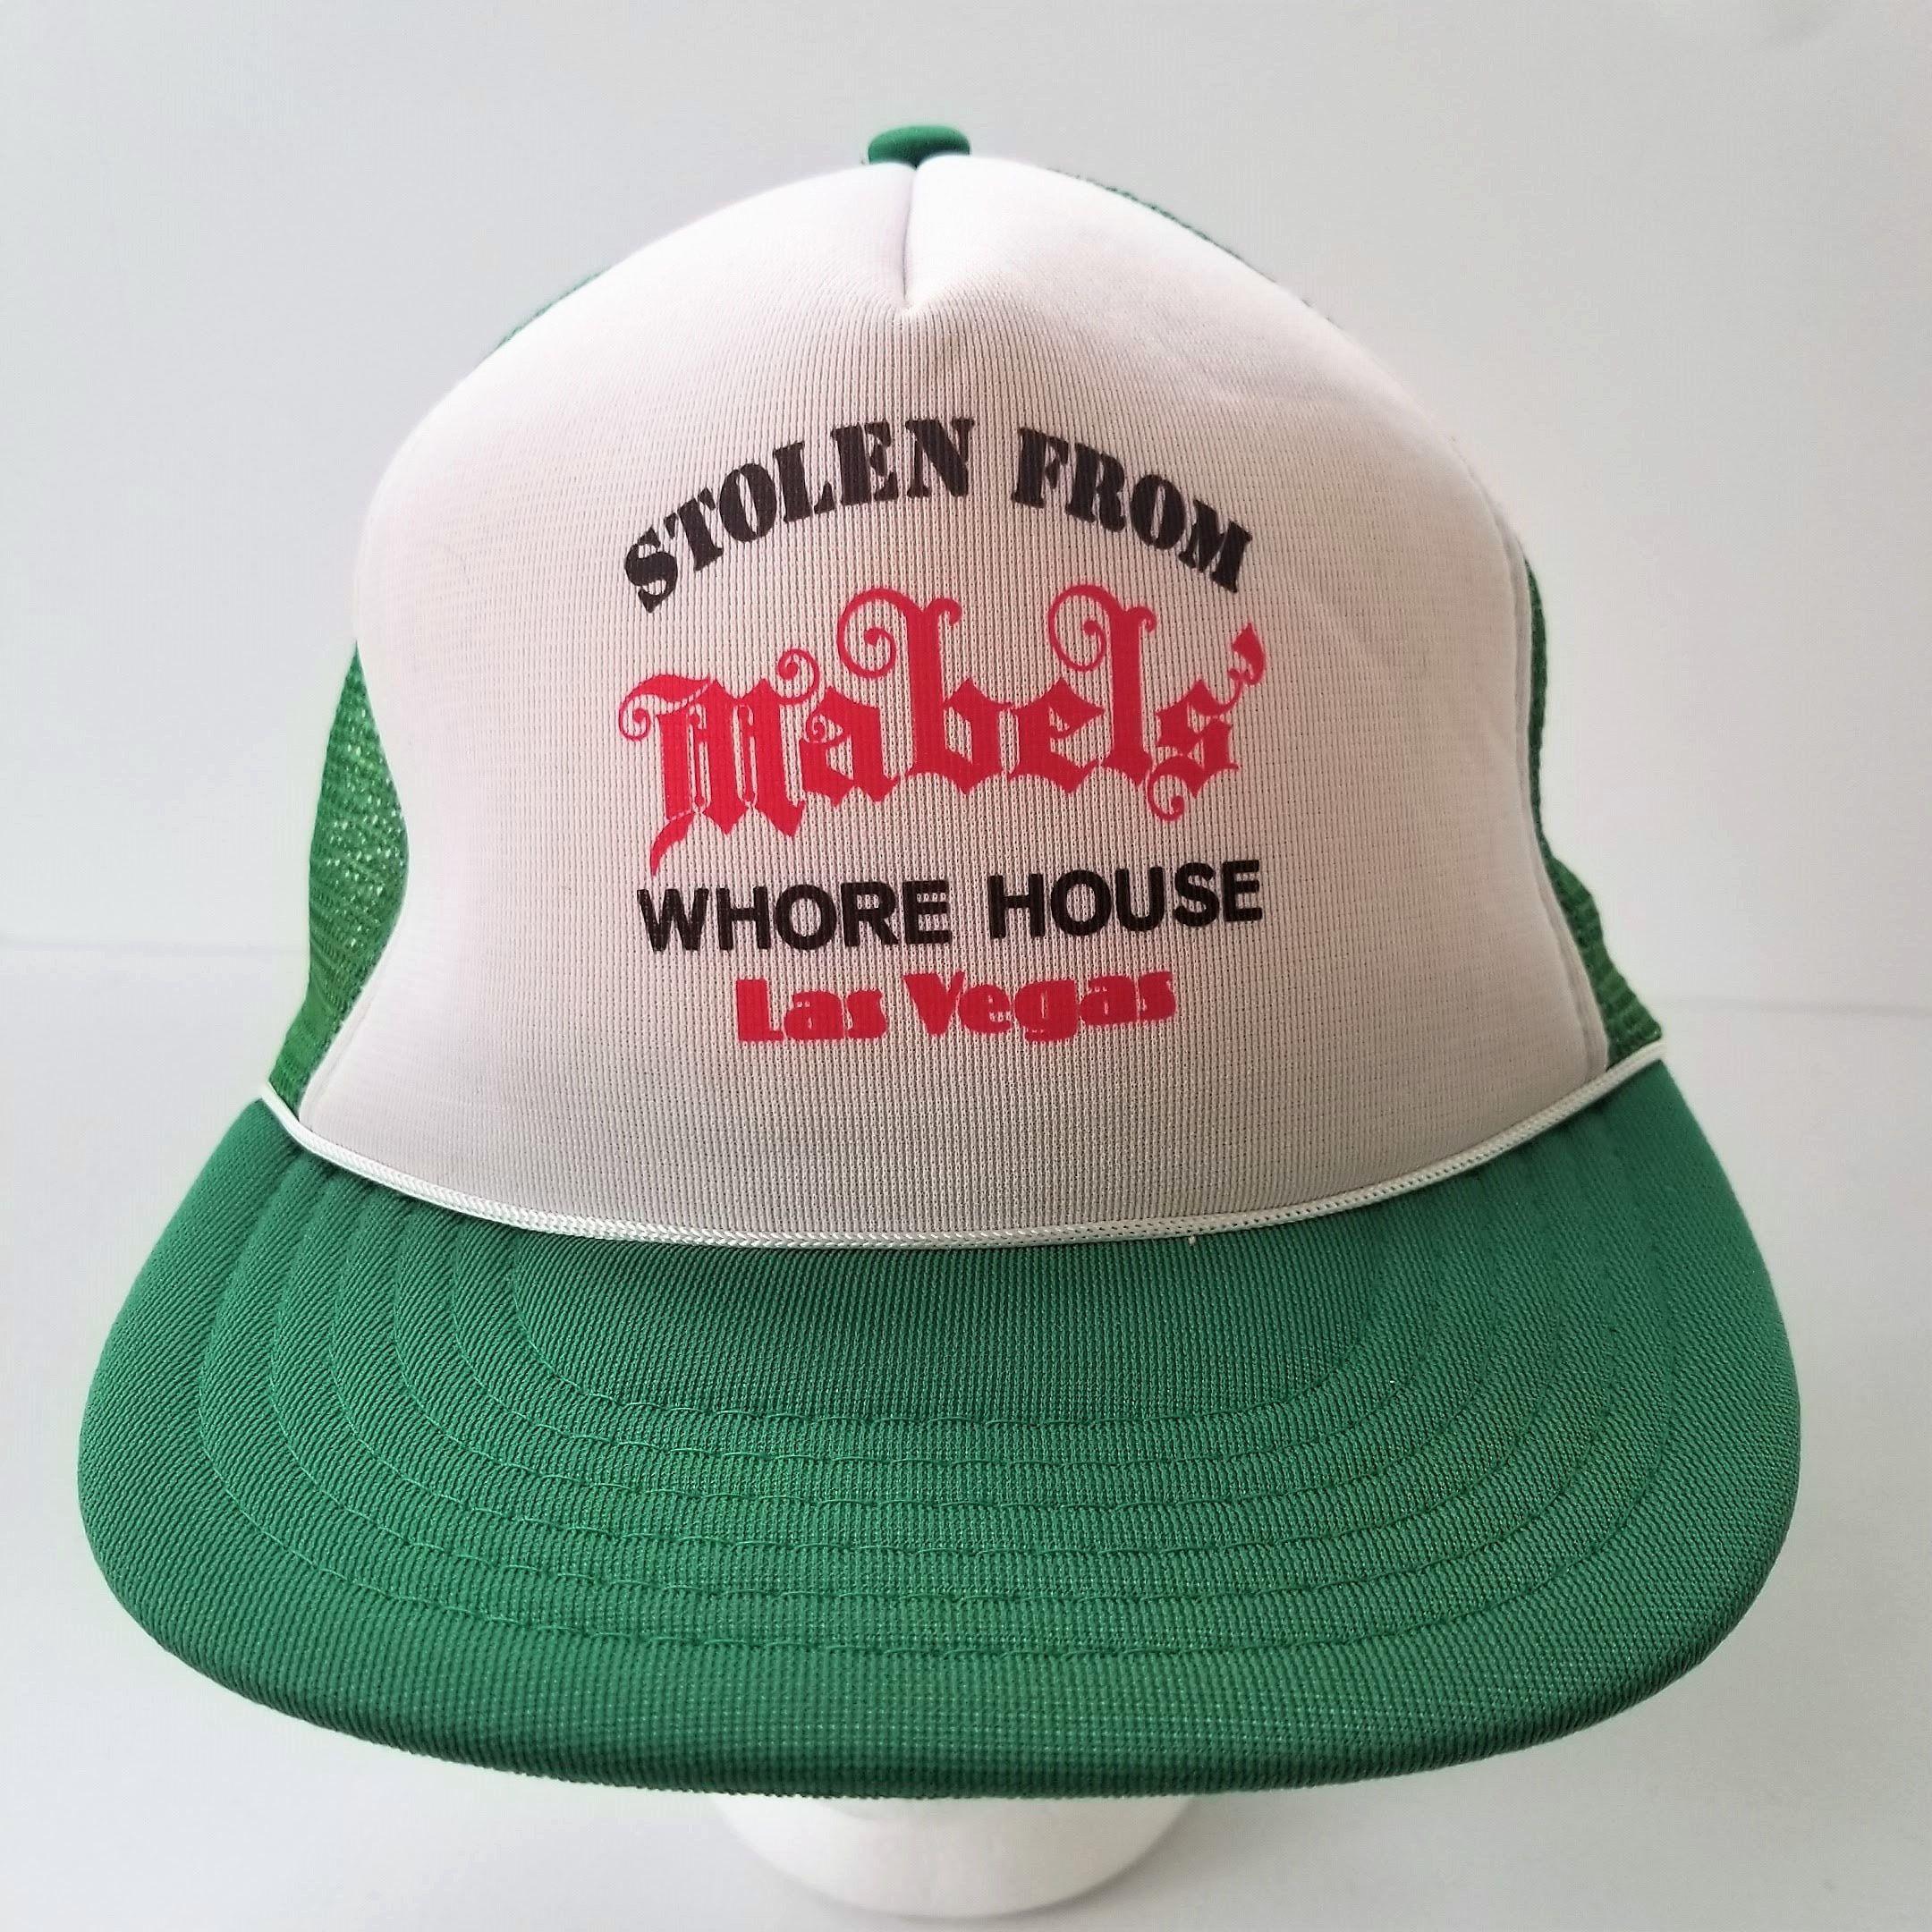 57b565d8f85 Vintage Trucker Hat 80s Mabels WhoreHouse Snapback Mesh Cap Green Las Vegas  Nevada Brothel by TraSheeWomen on Etsy  vegas  lasvegas  vintagevegas ...